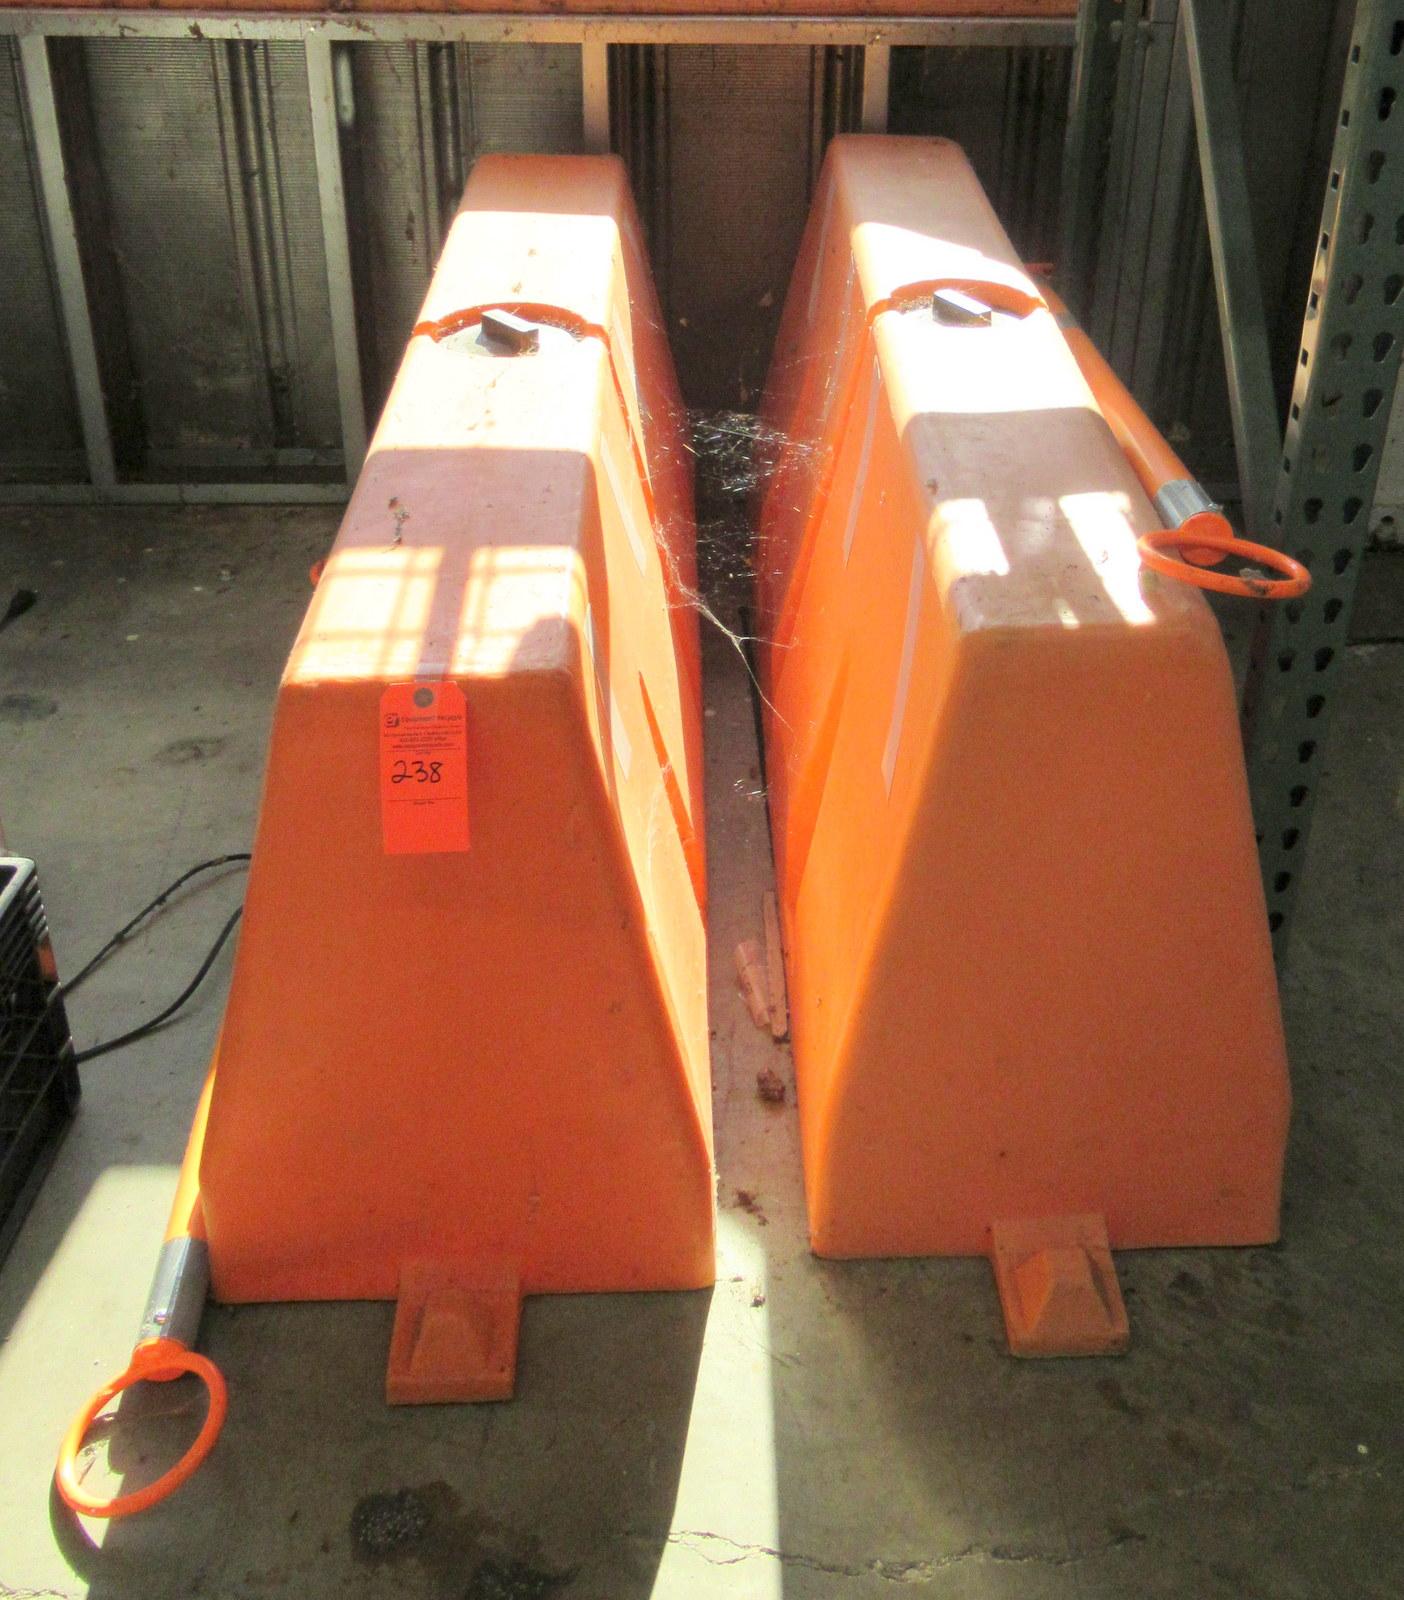 "Lot 238 - Uline H-4583 Safety Barricades 60"" x 16"" x 24"""